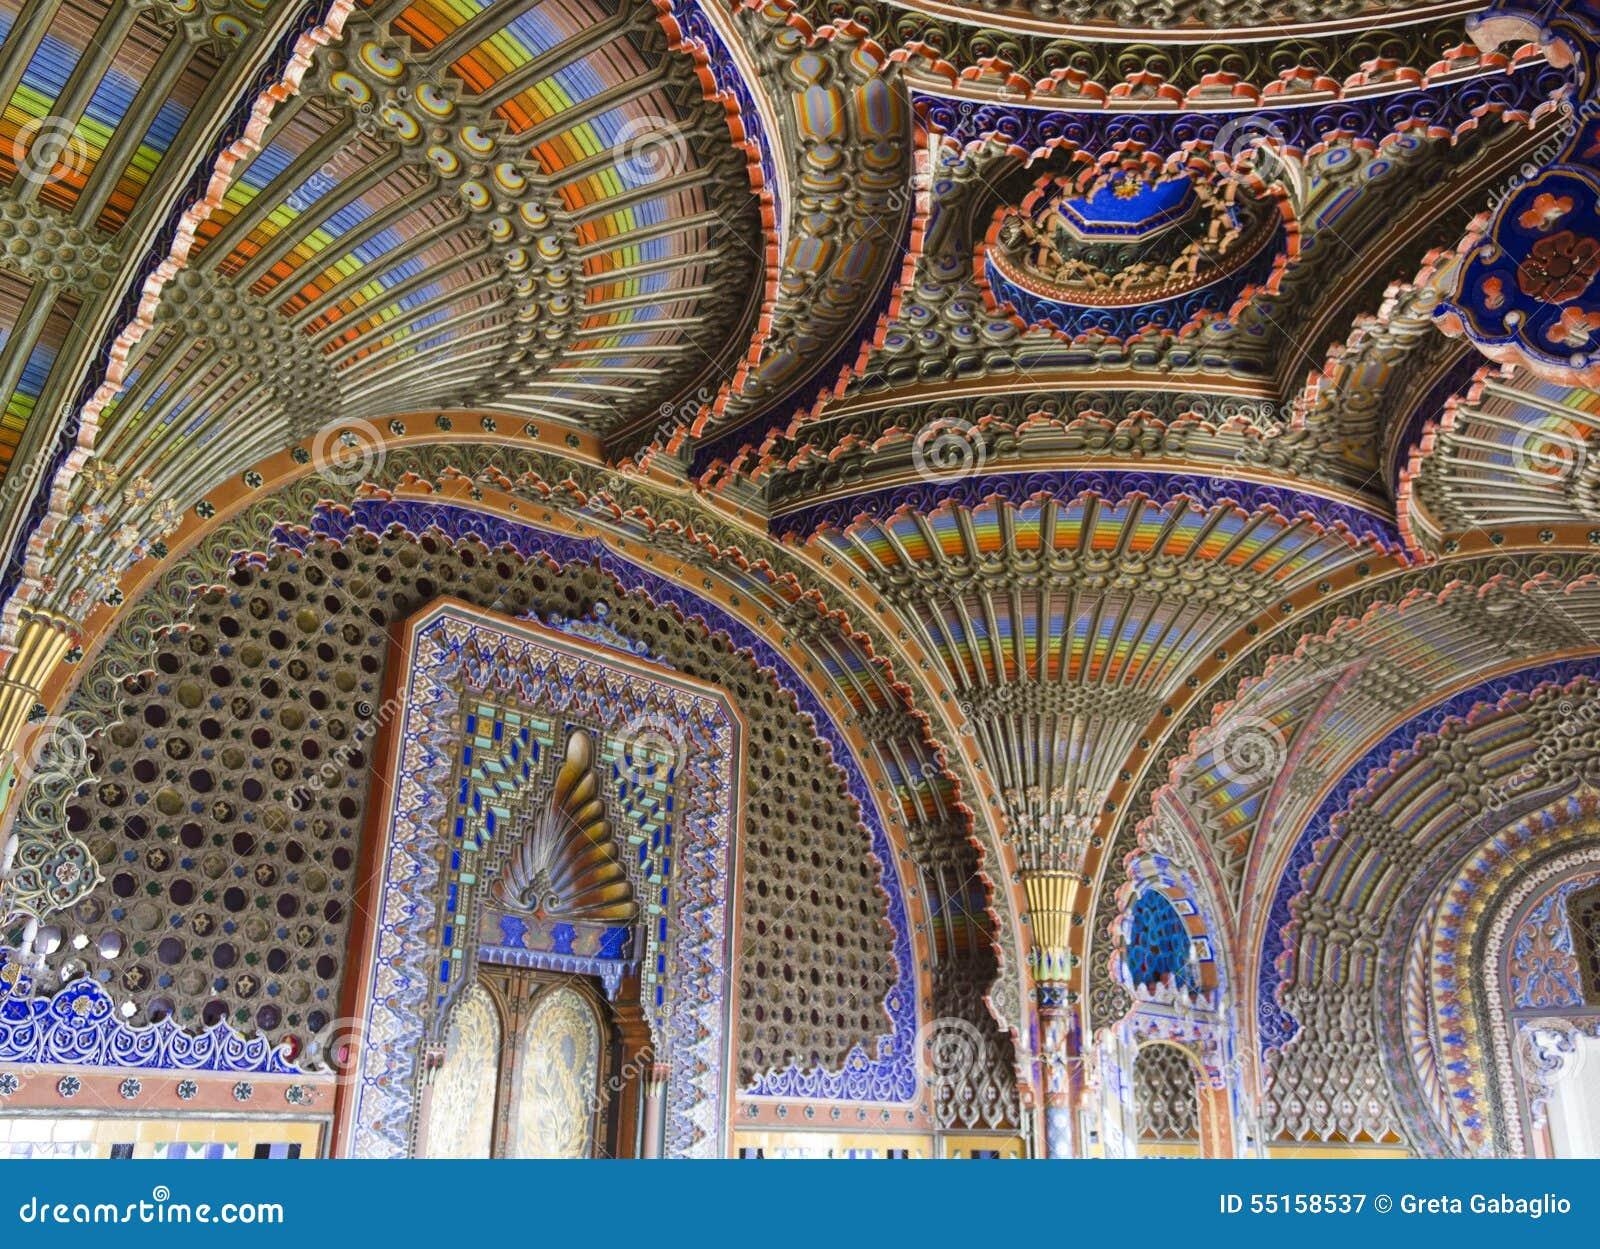 Reggello Italy  city images : REGGELLO, ITALY MAY 2 2015: The magnificent Peacock Room inside the ...